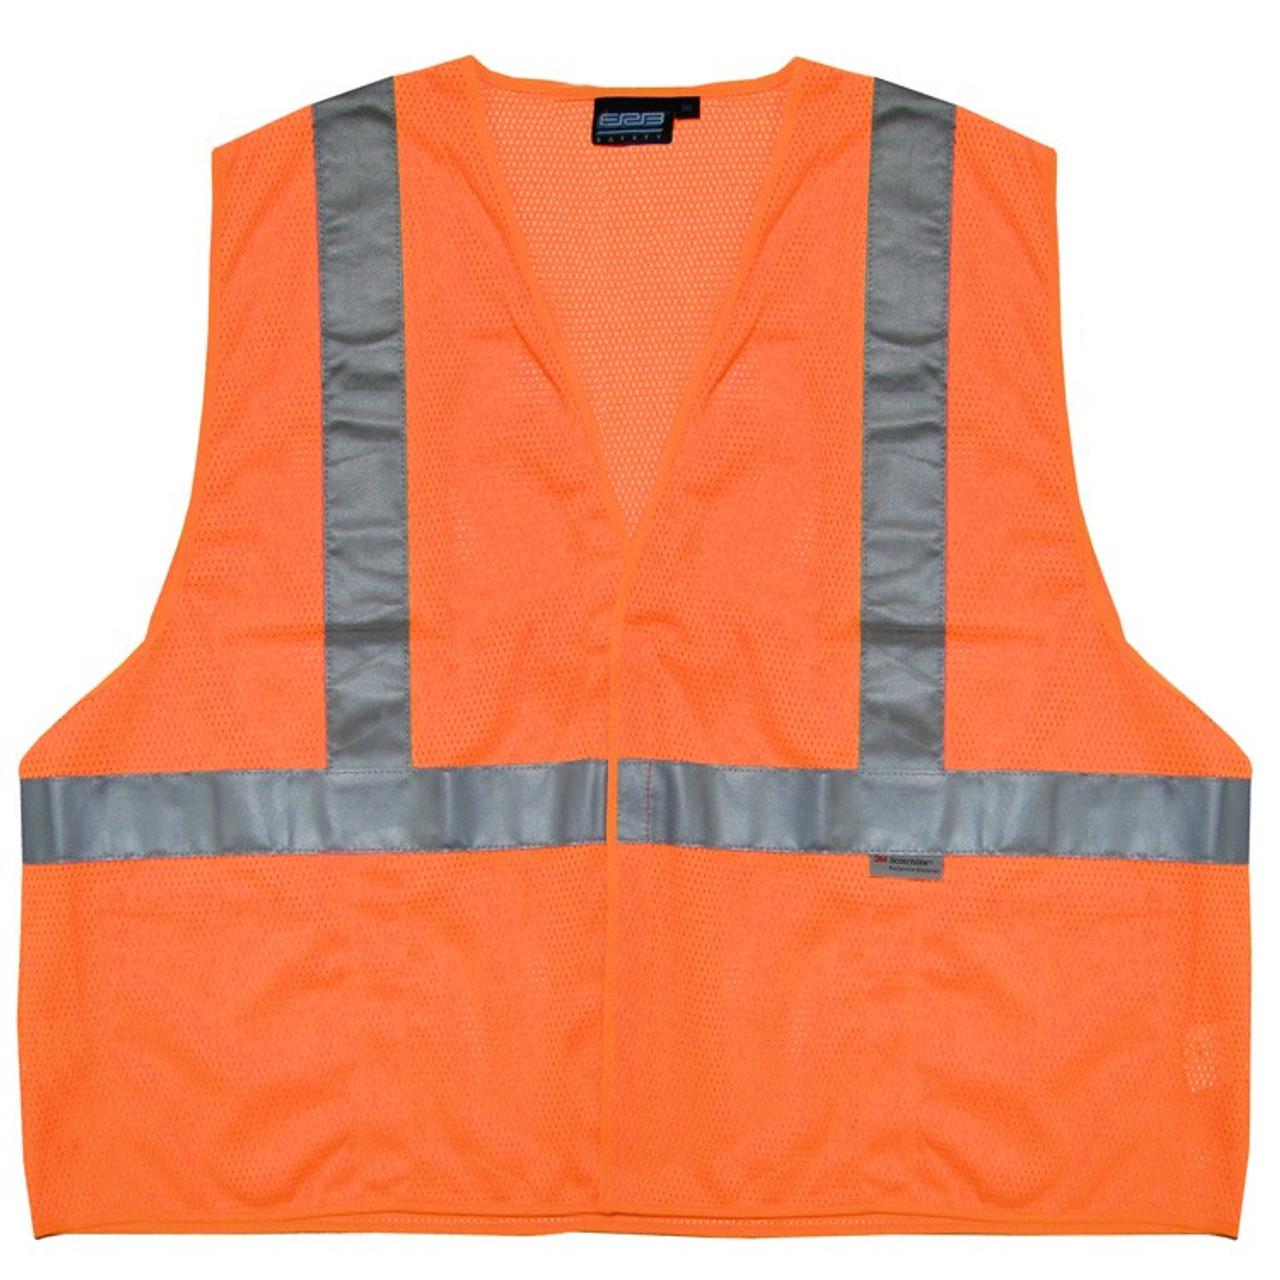 d07bd7b15969 14519 ERB S15 Class 2 Mesh Hi Viz Orange Large Safety Apparel ...